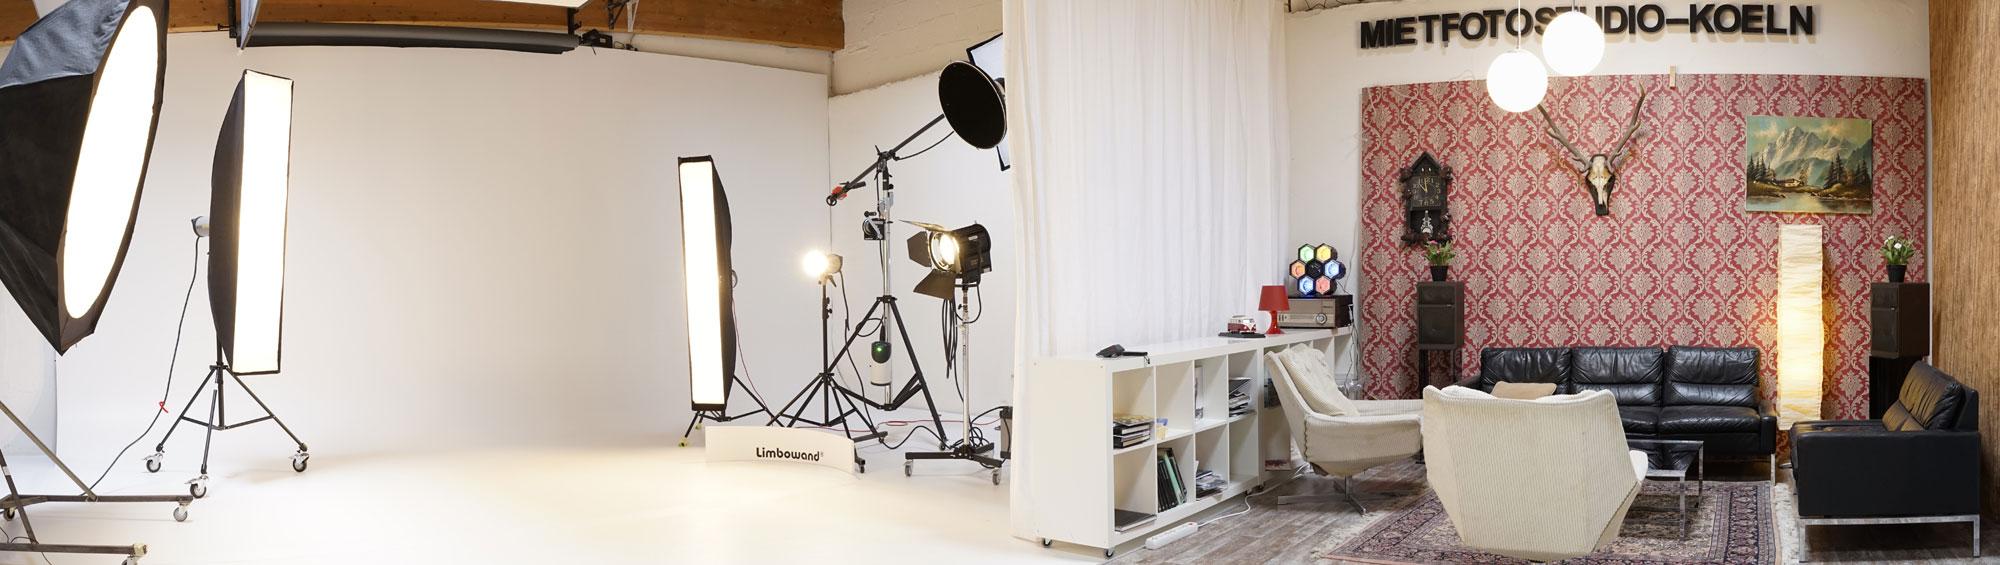 Atelier5b Fotostudio